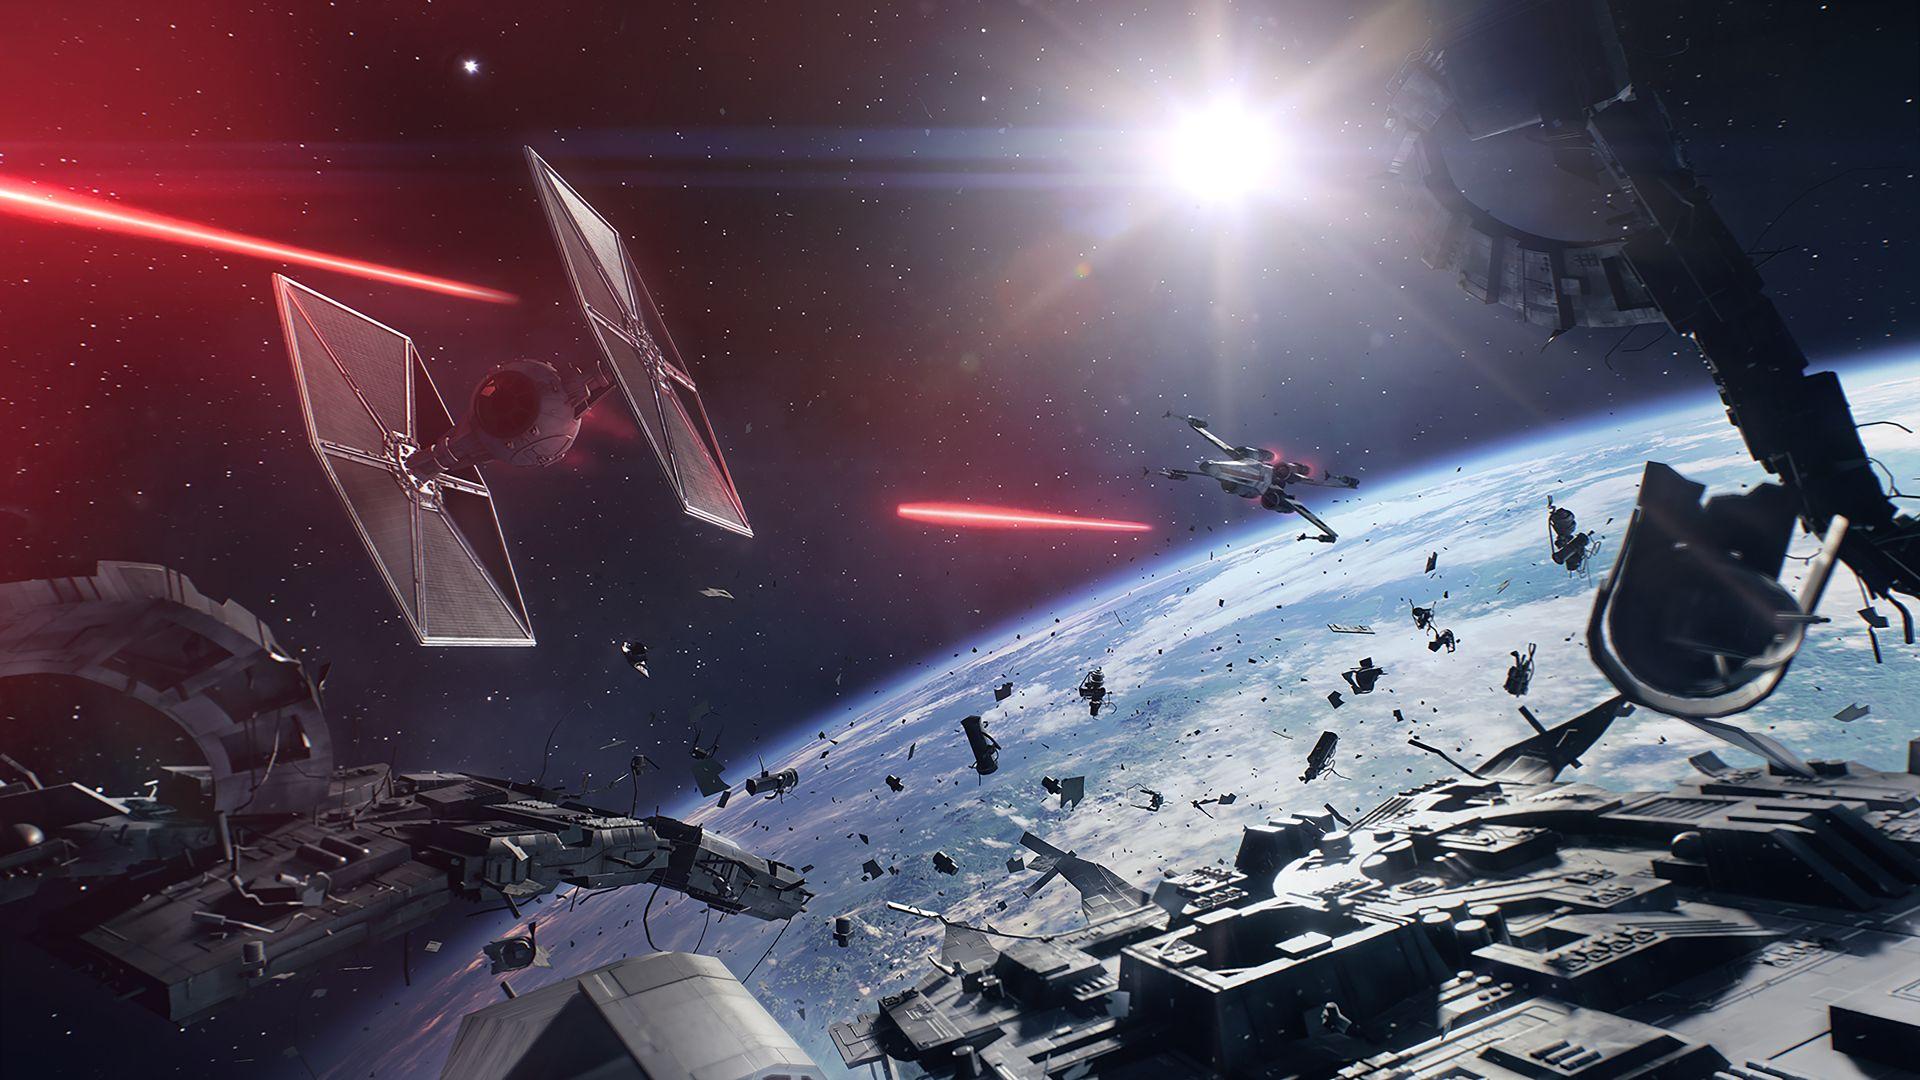 SW_SPACE_3.jpg